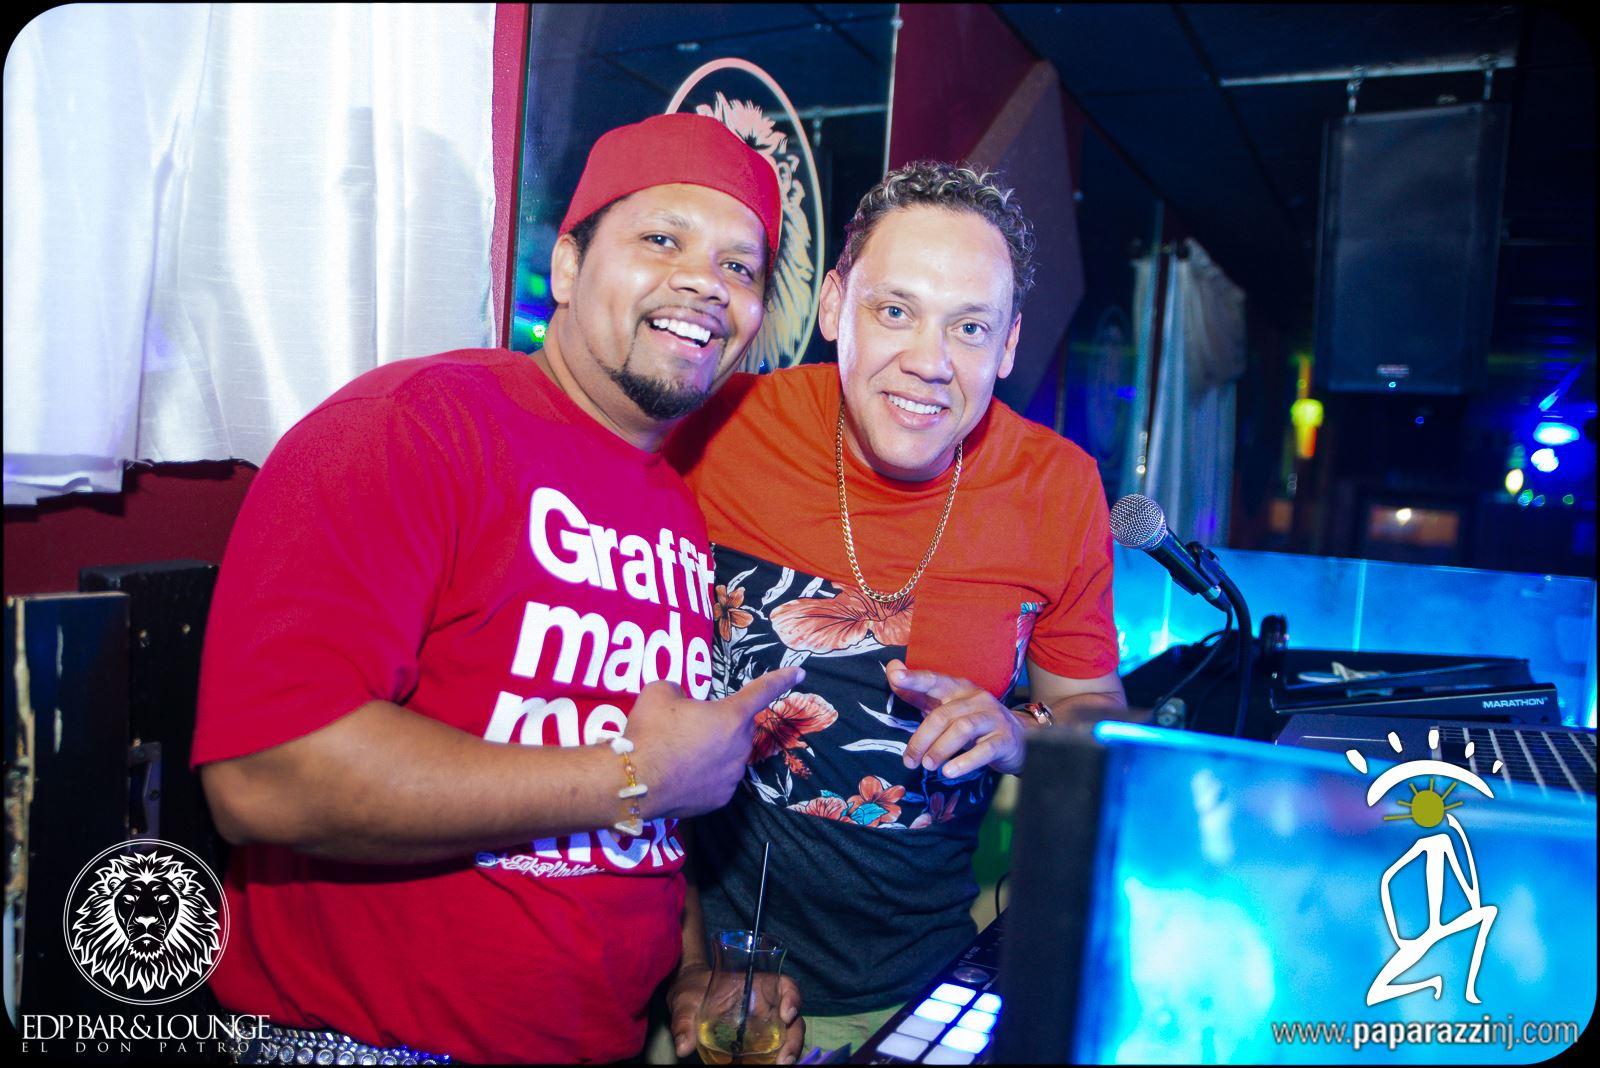 ON CUE DJS NEW JERSEY